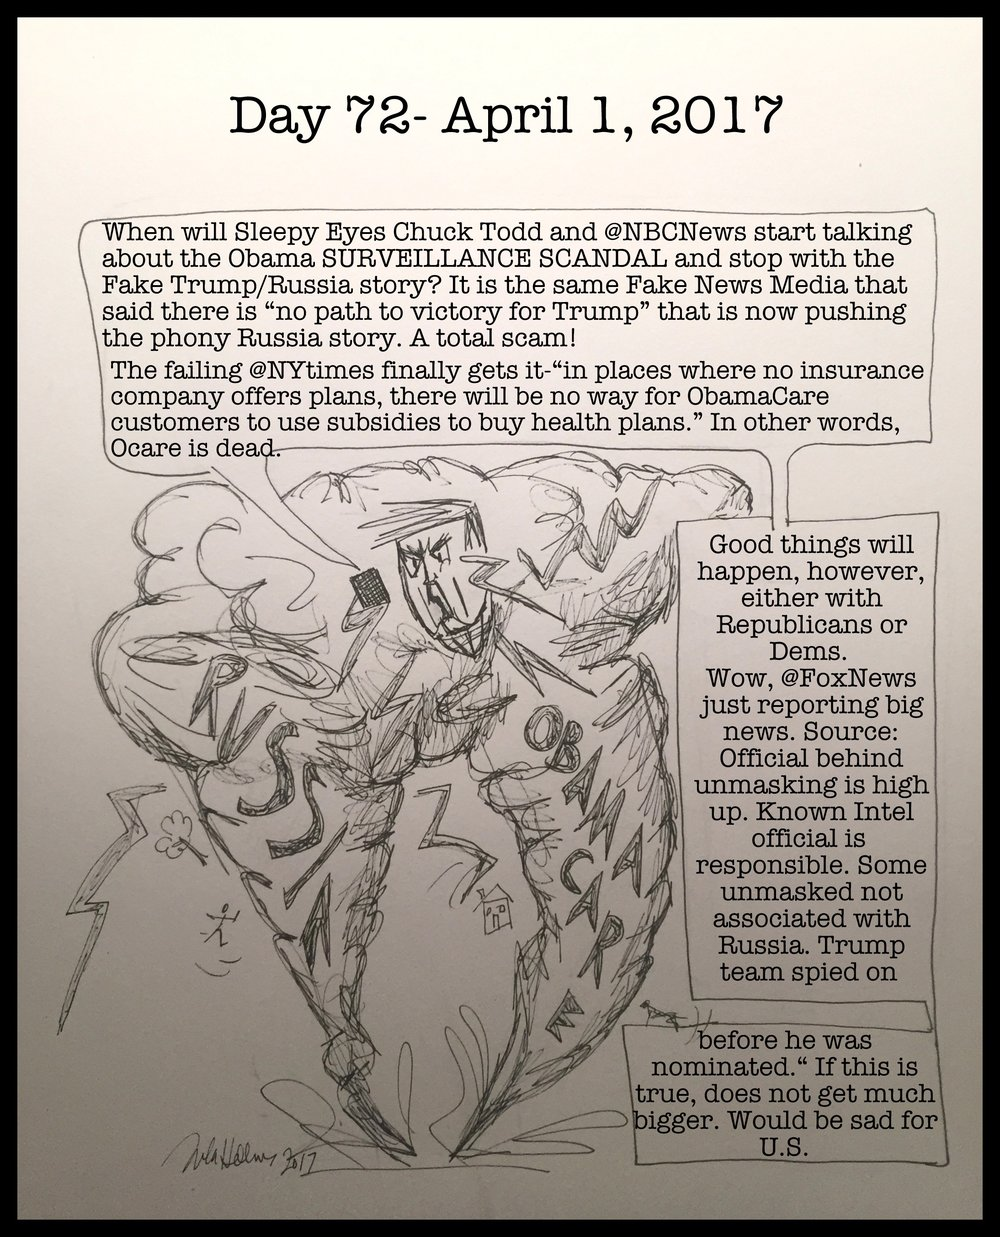 Day 72- April 1, 2017- Copyright 2017